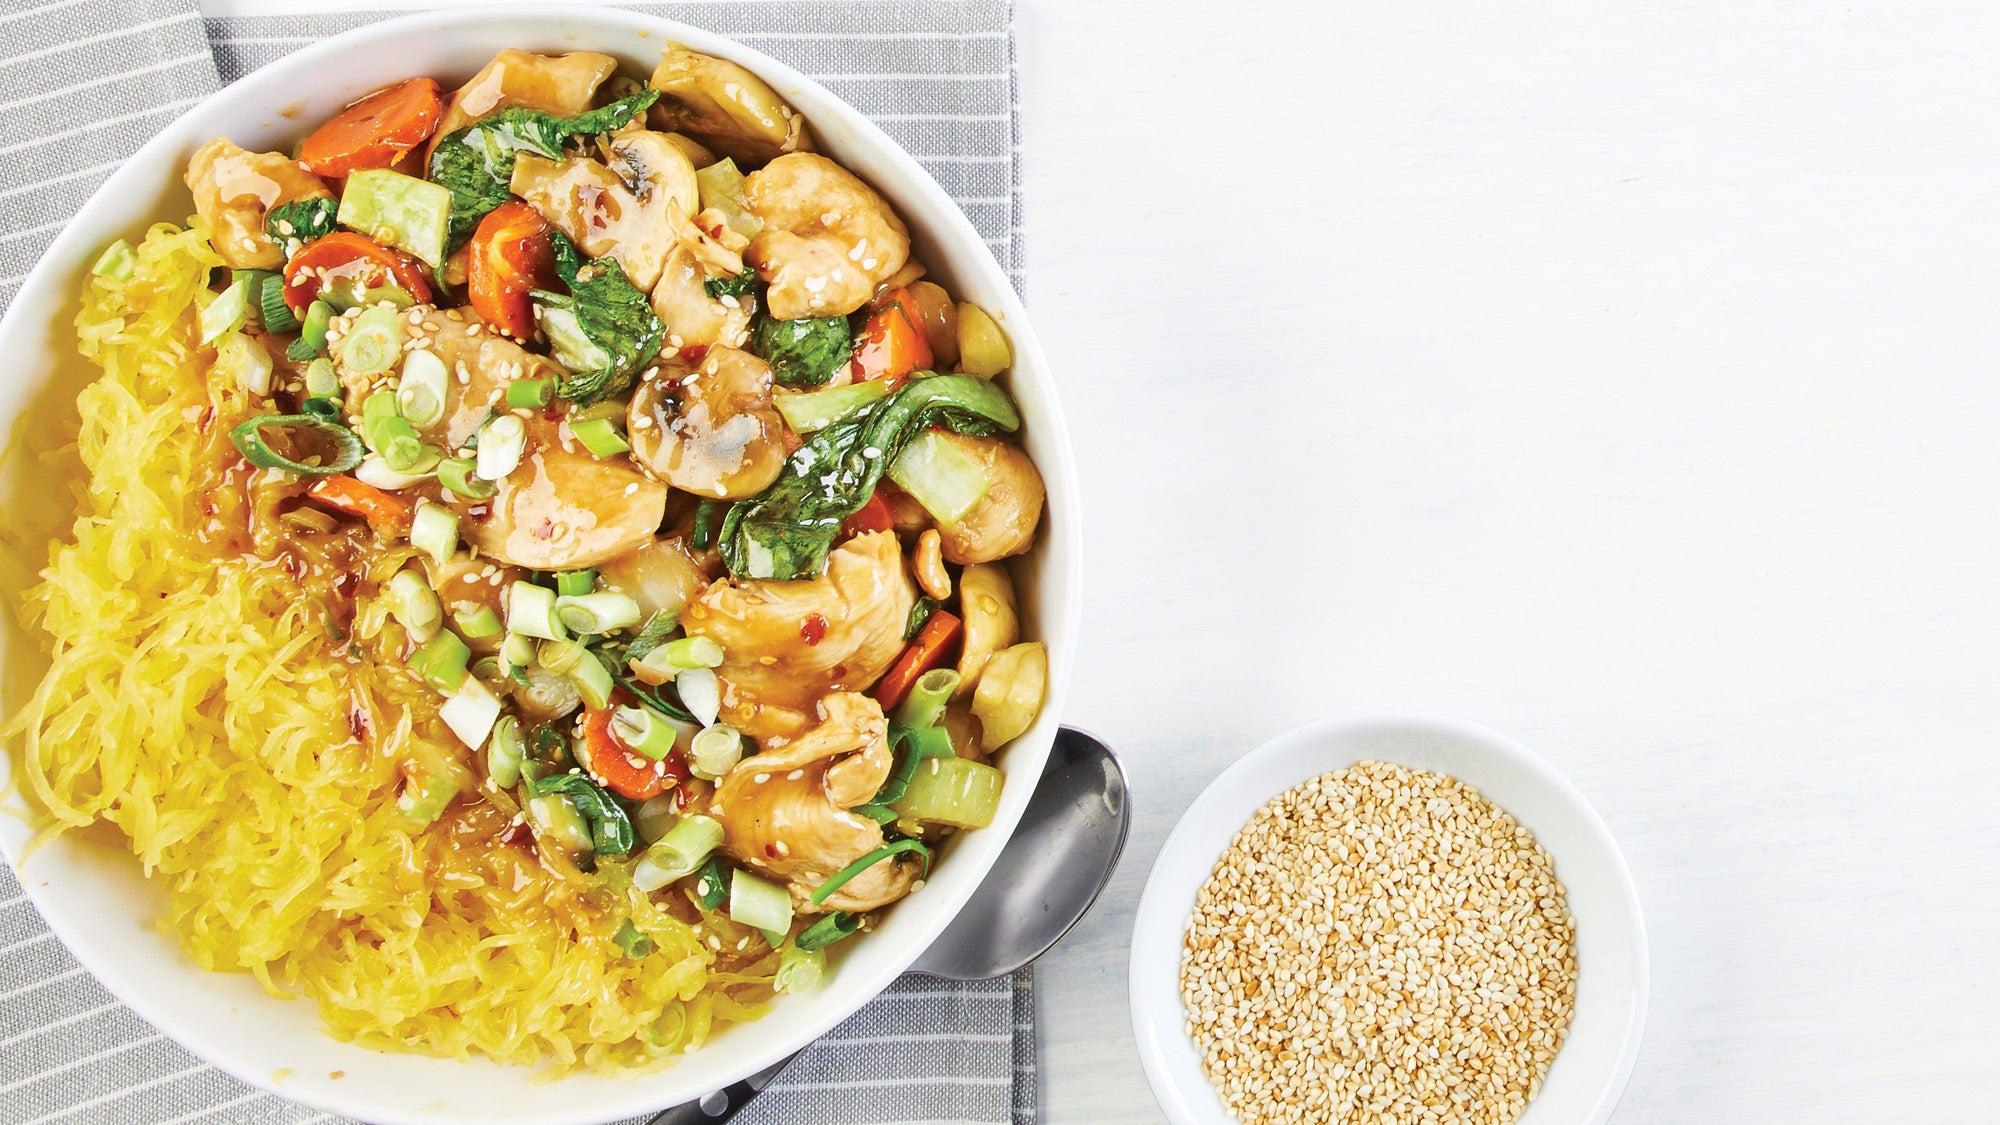 Ginger Chicken Stir-Fry with Spaghetti Squash recipe